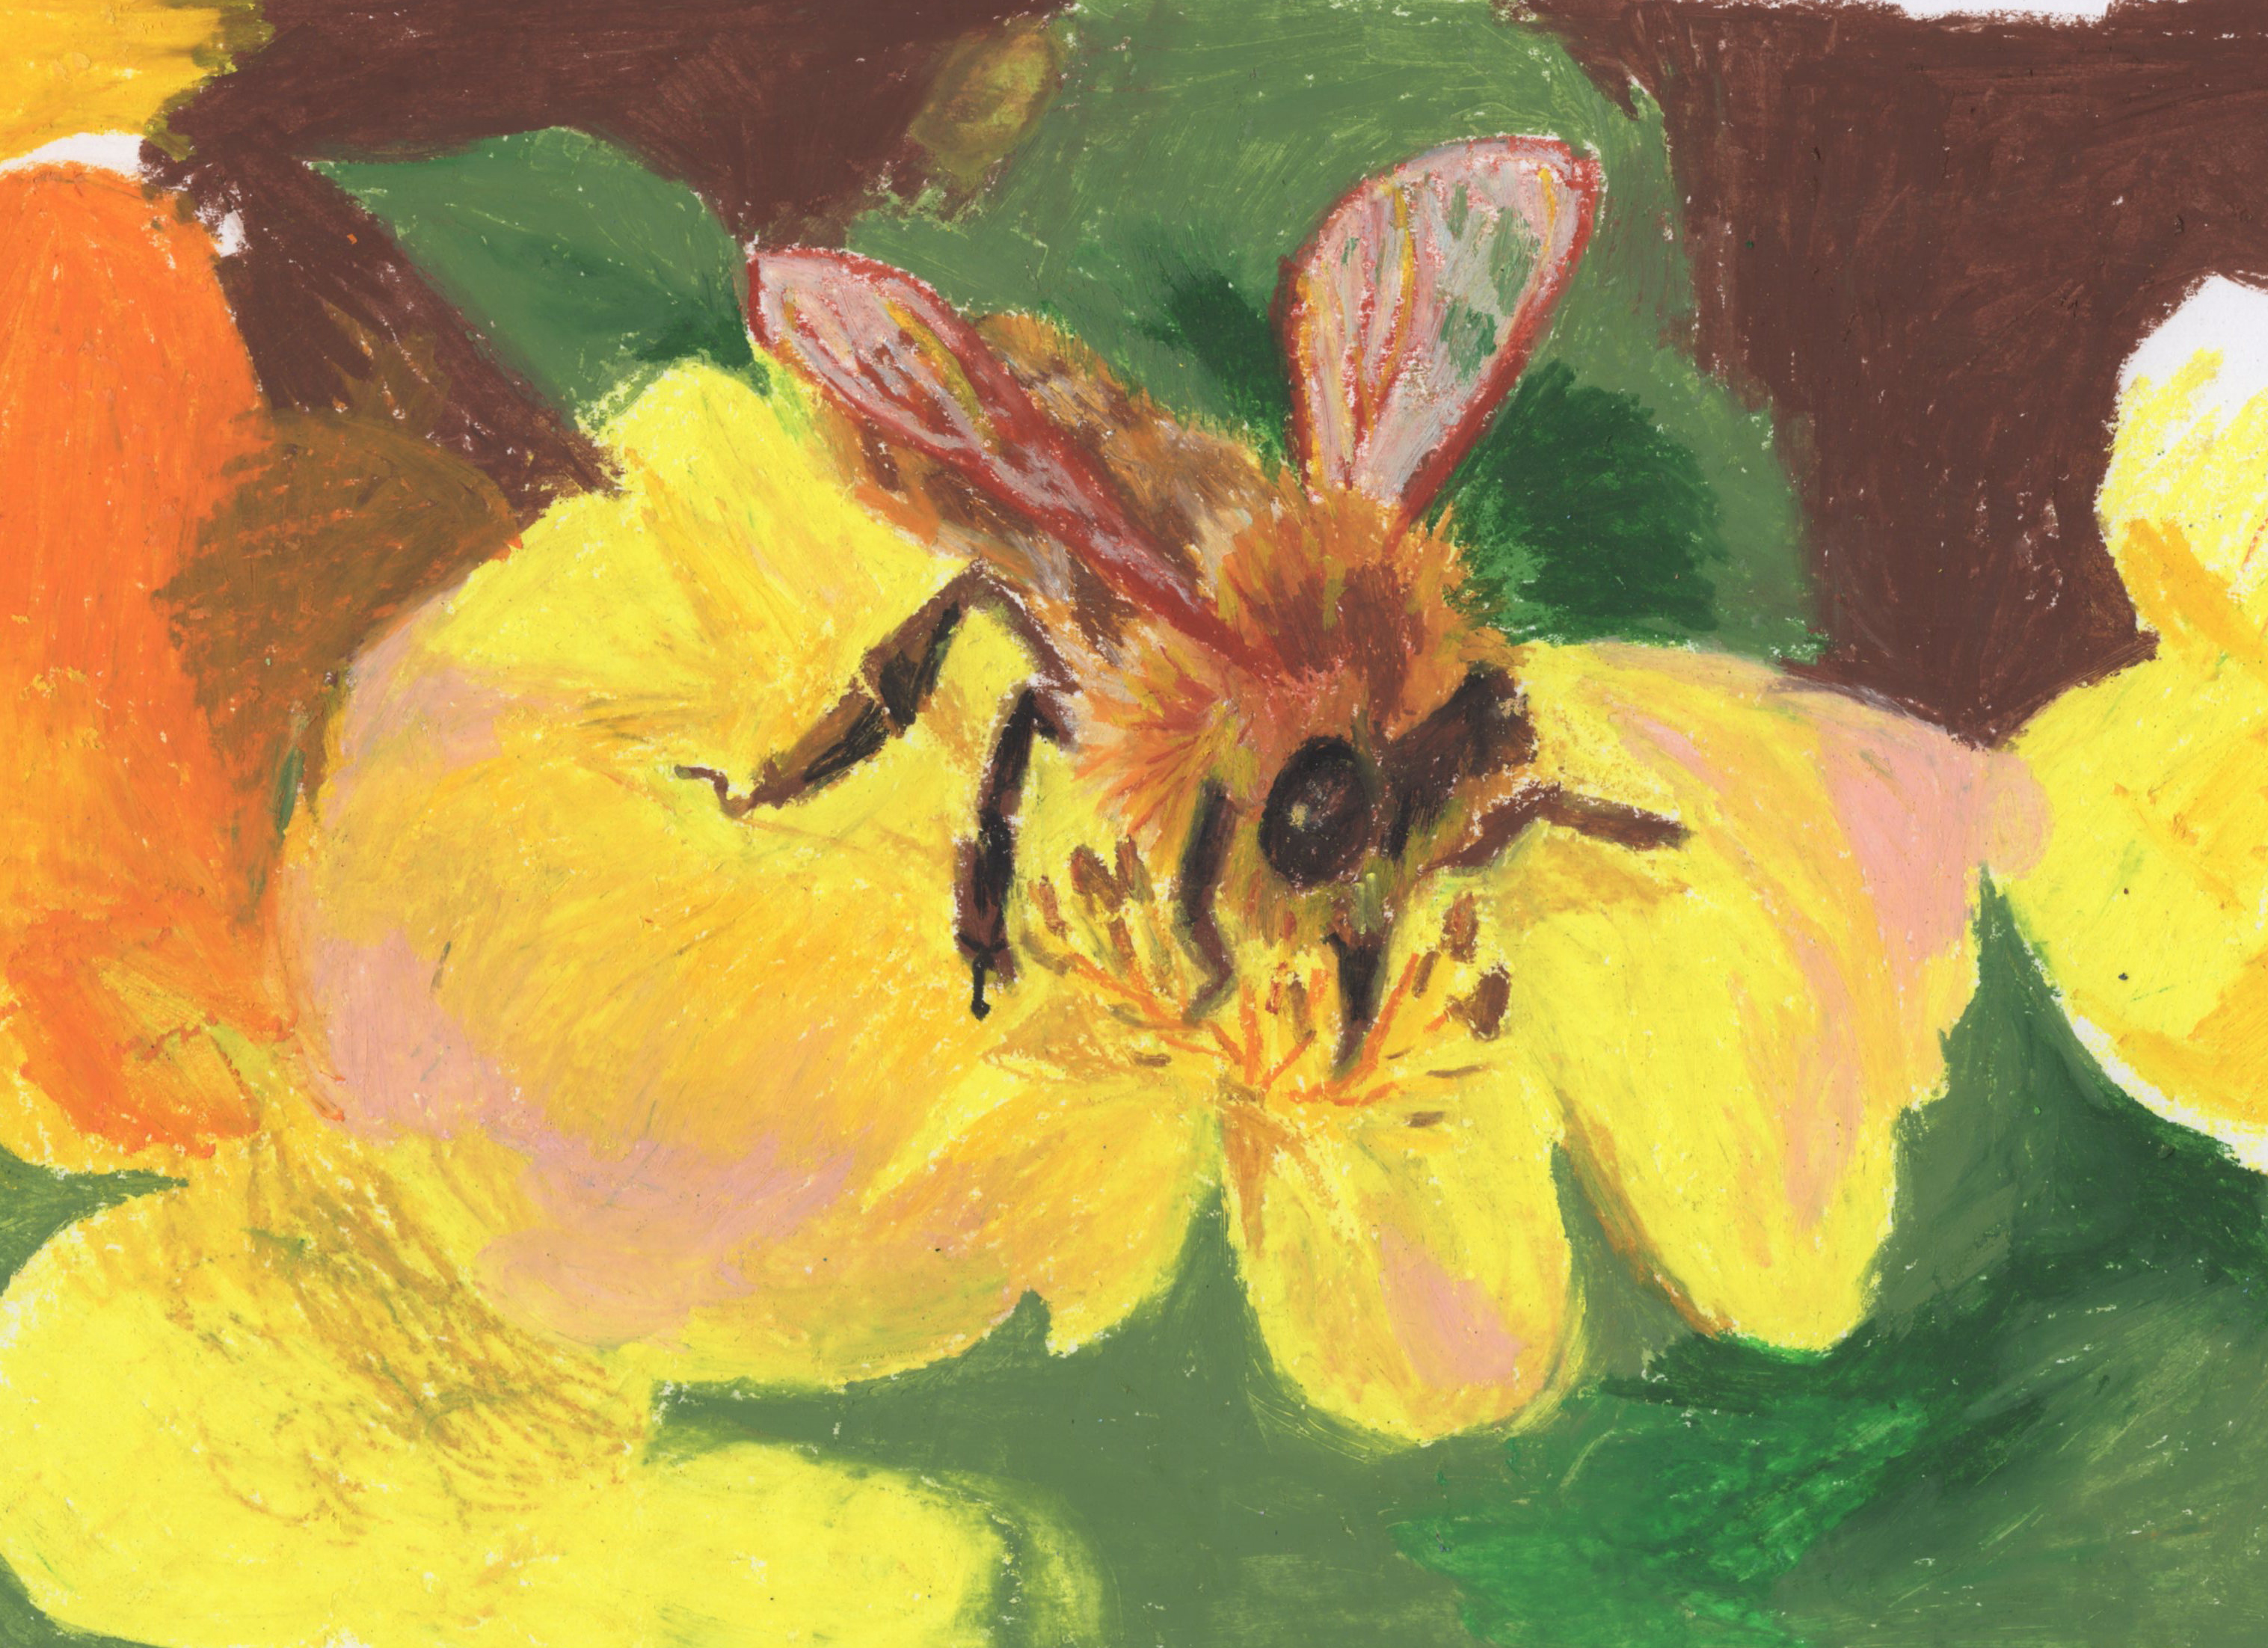 Hylaeus anthracinus; Yellow faced be